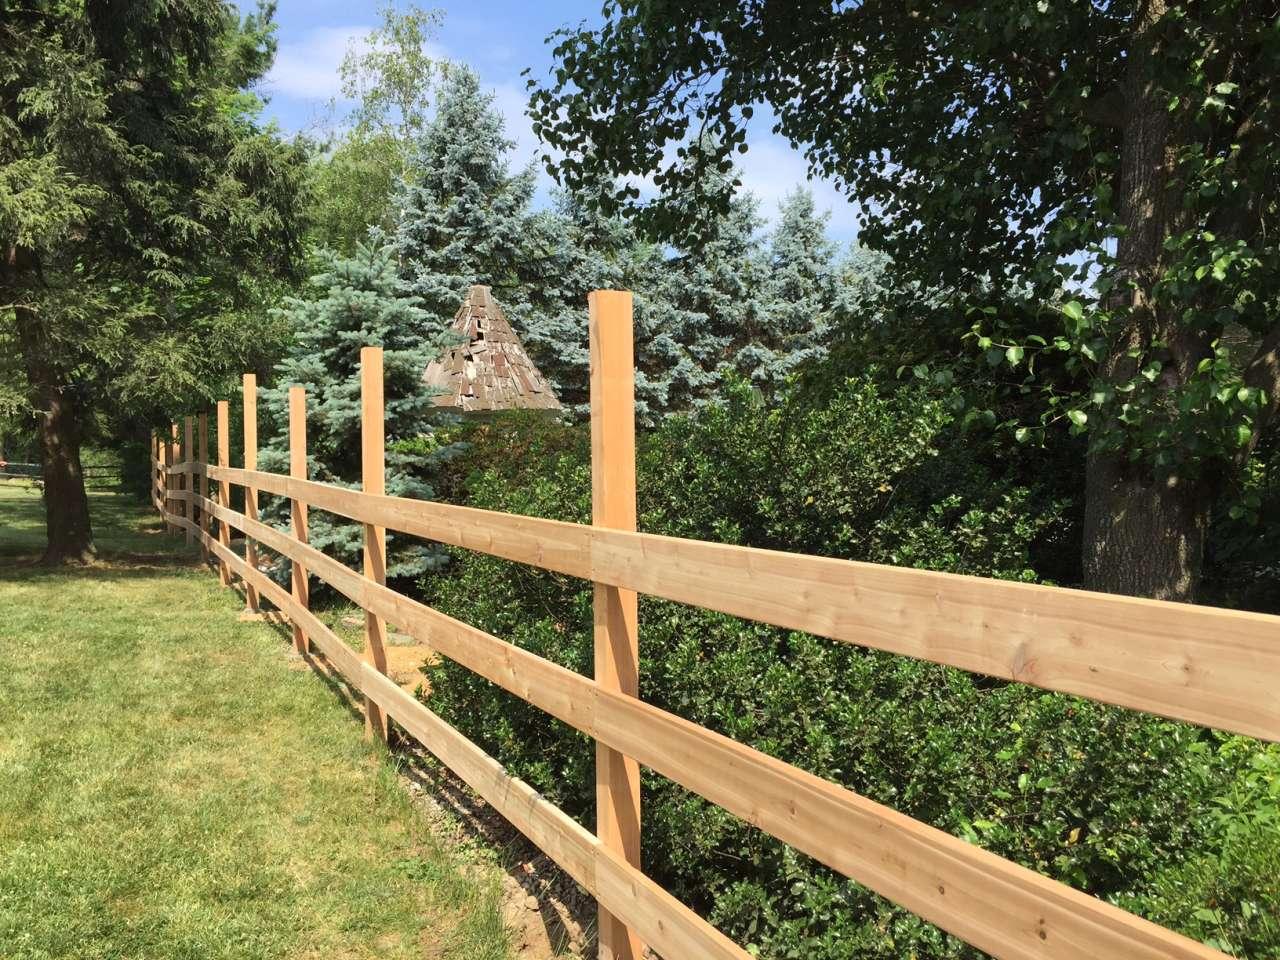 How to Make a Fence - Cedar Post And Rail Fence - Lehman Lane